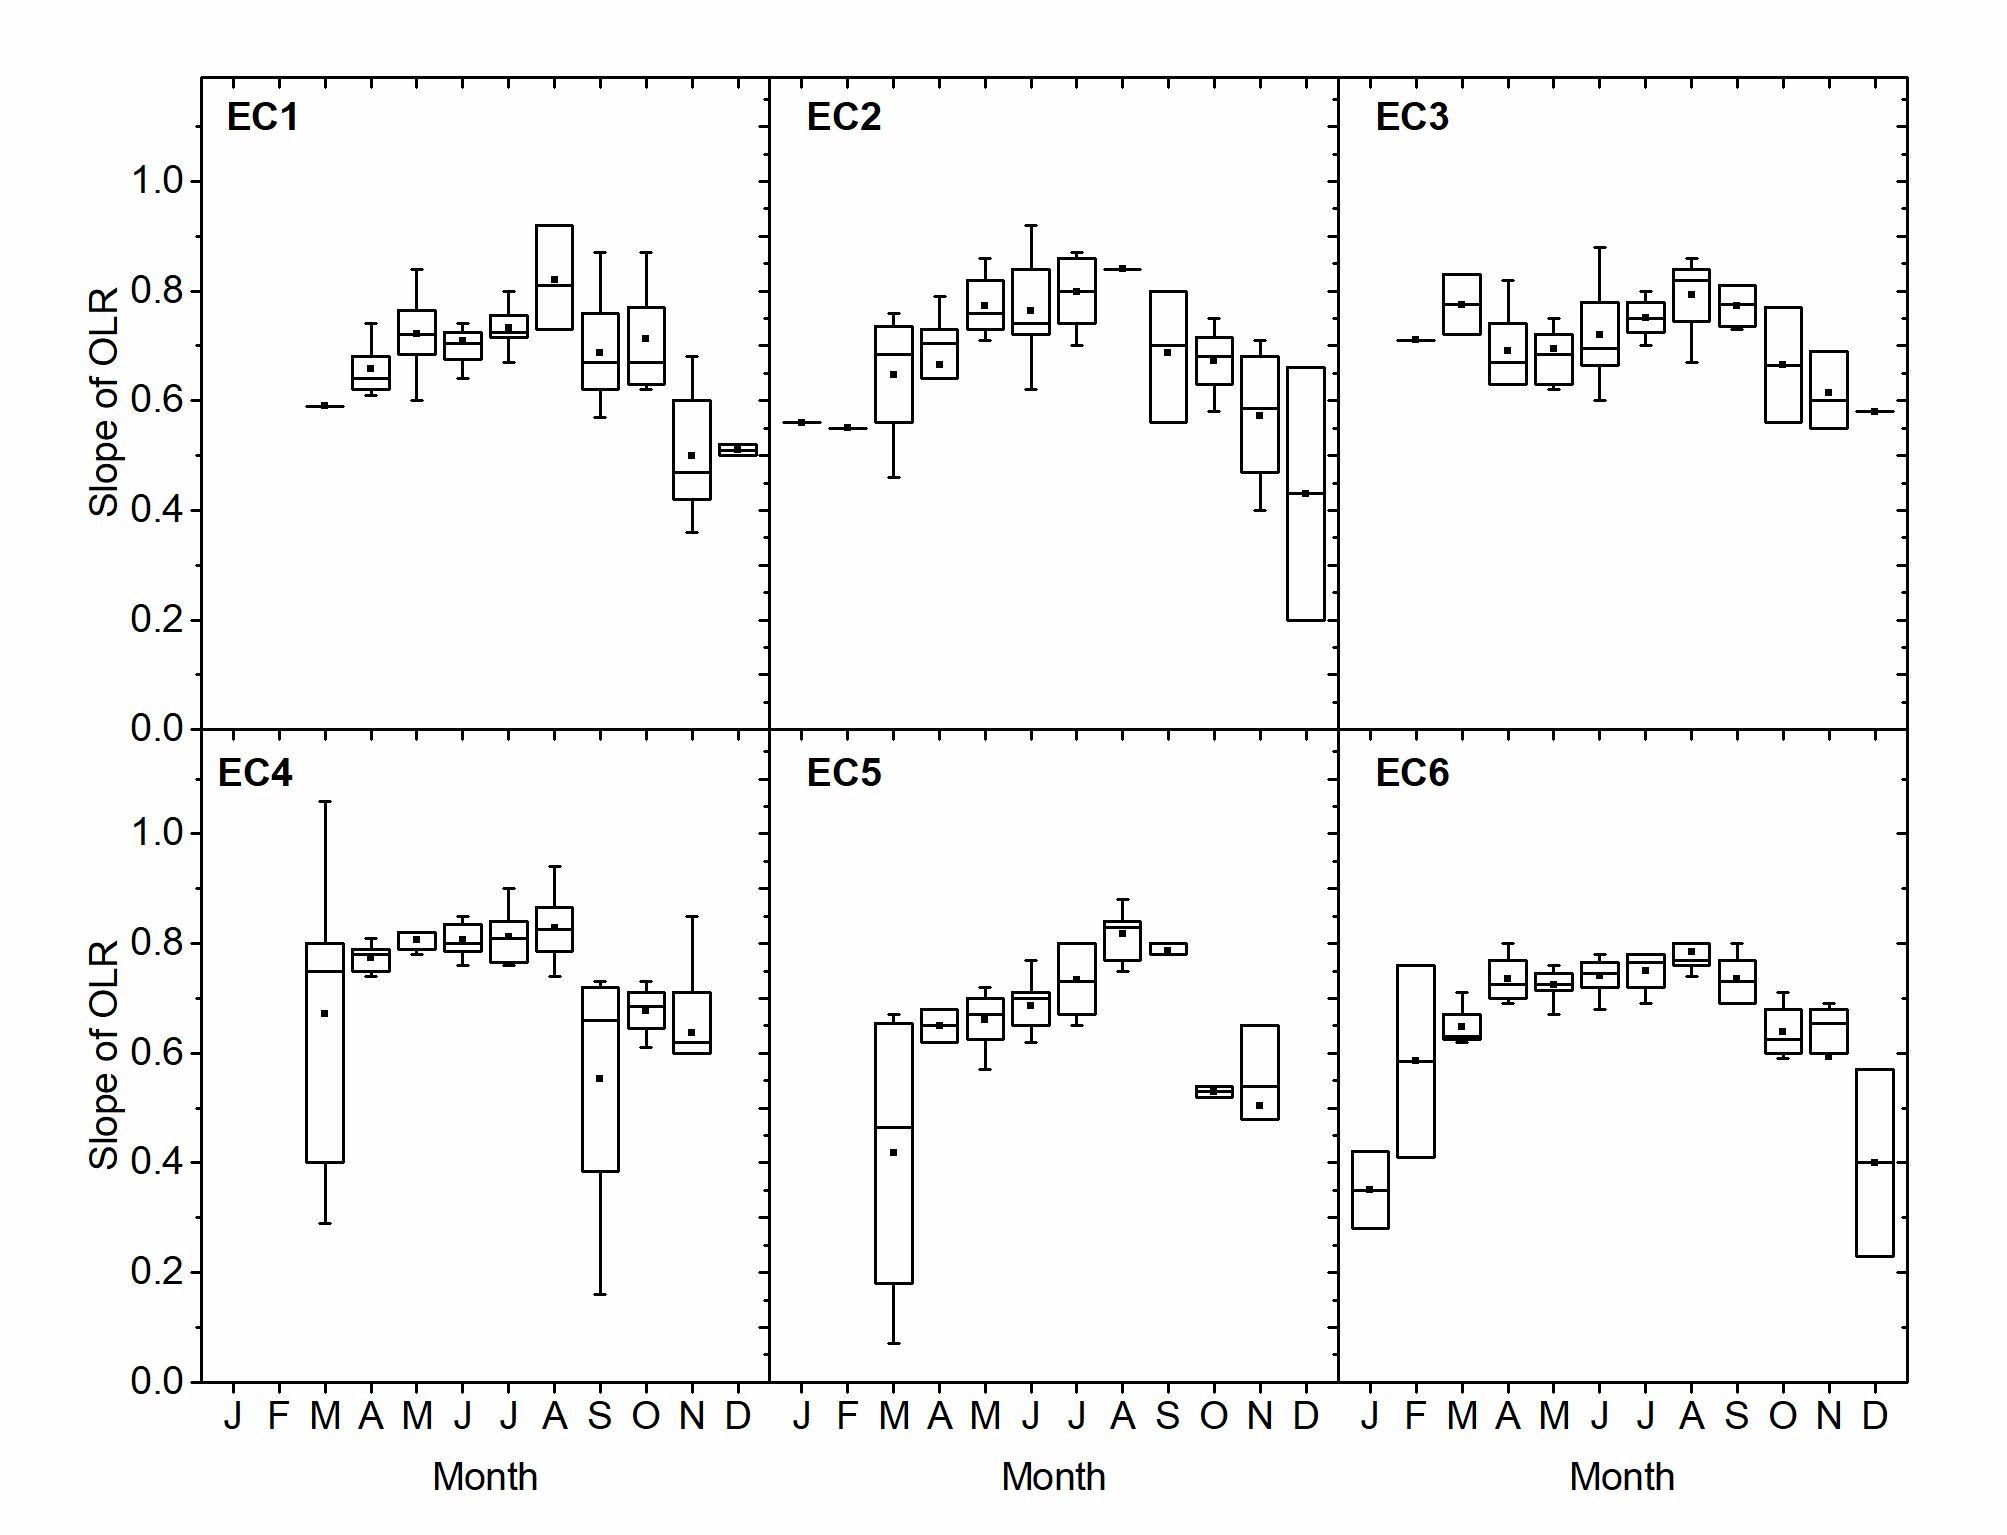 BG - Evaluating multi-year, multi-site data on the energy